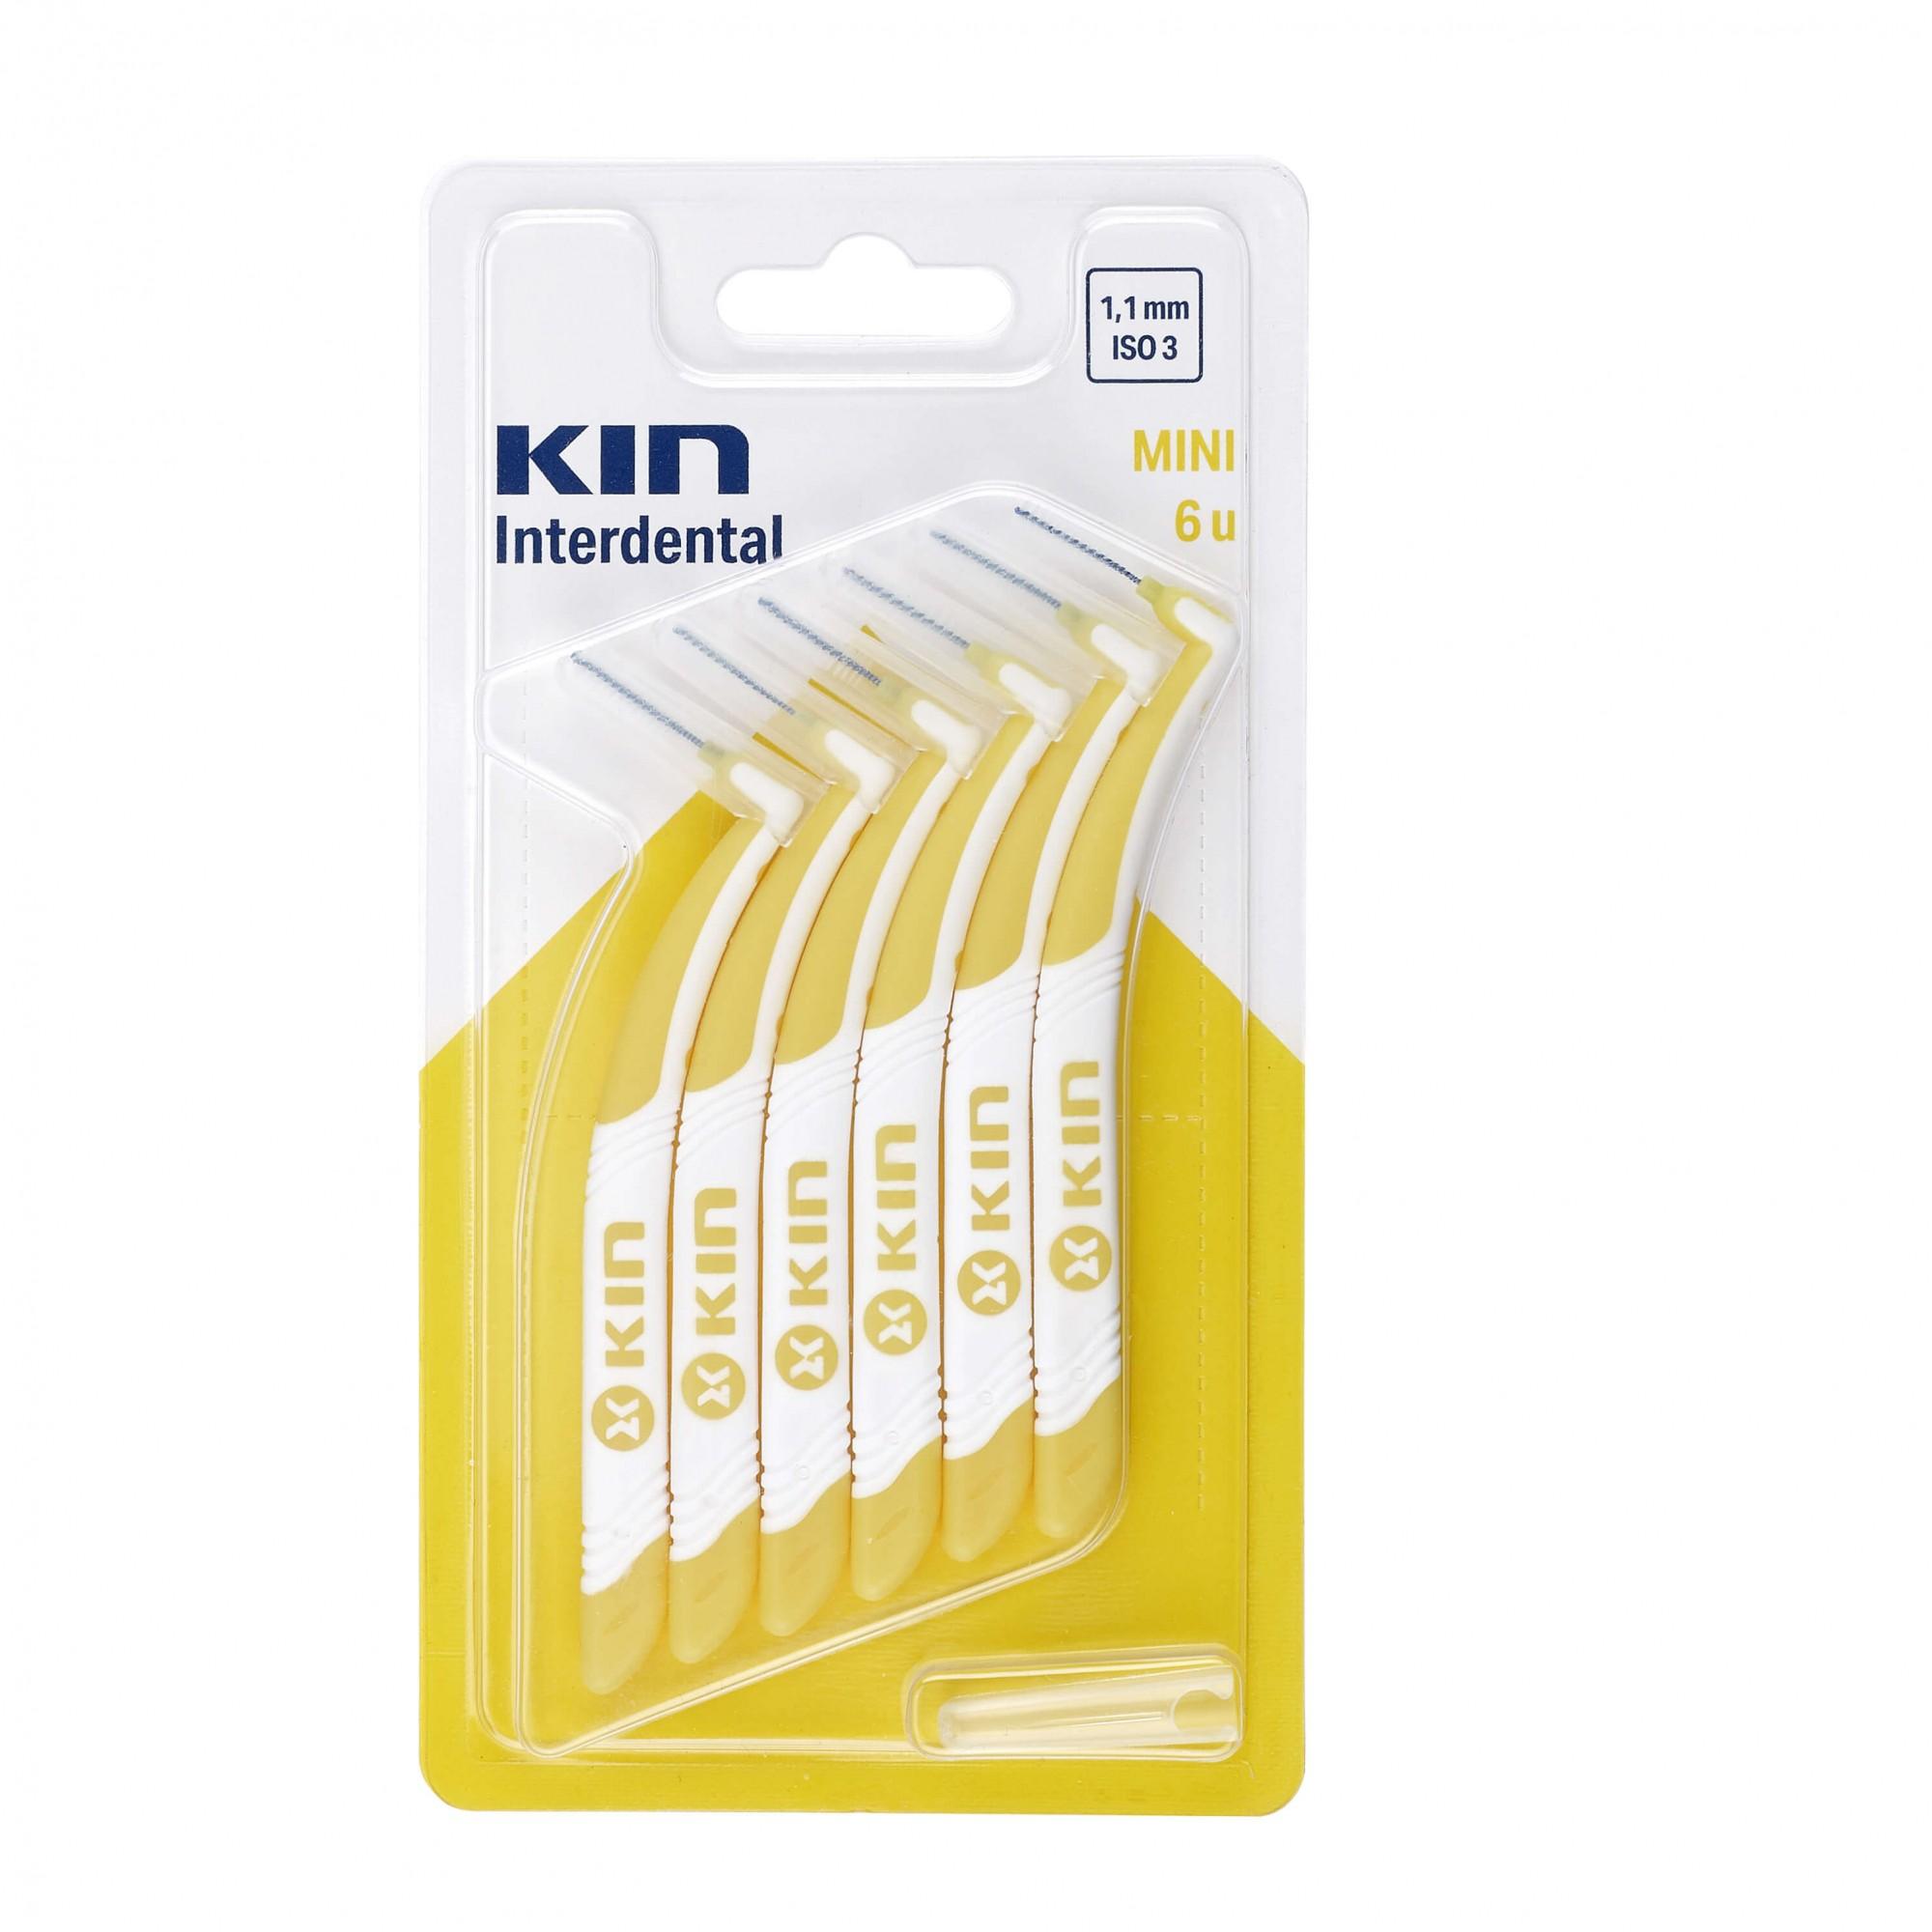 Escova Kin Interdentária Mini (1,1mm - ISO3) - amarela